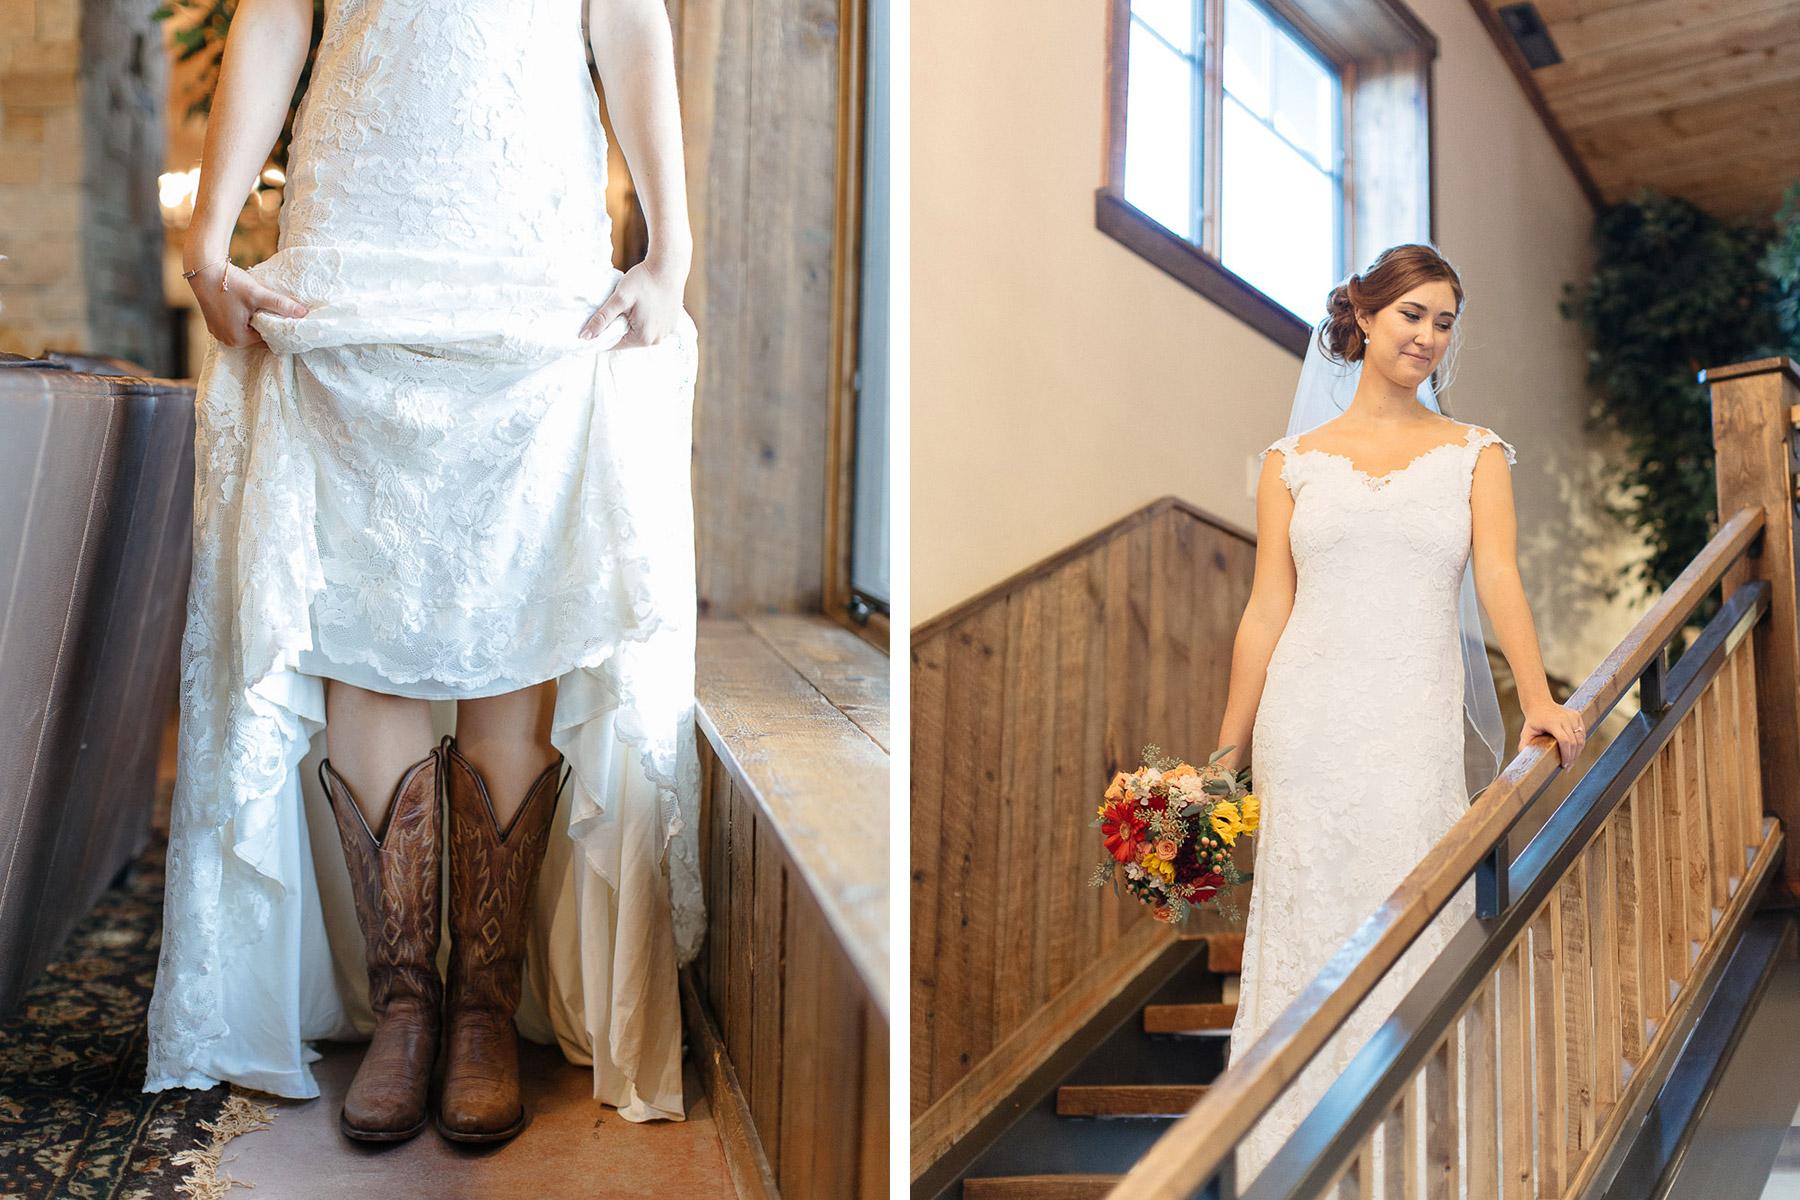 160902-Luxium-Weddings-Arizona-Michael-Becca-Spruce-Mountain-Ranch-Colorado-webres-026a.jpg